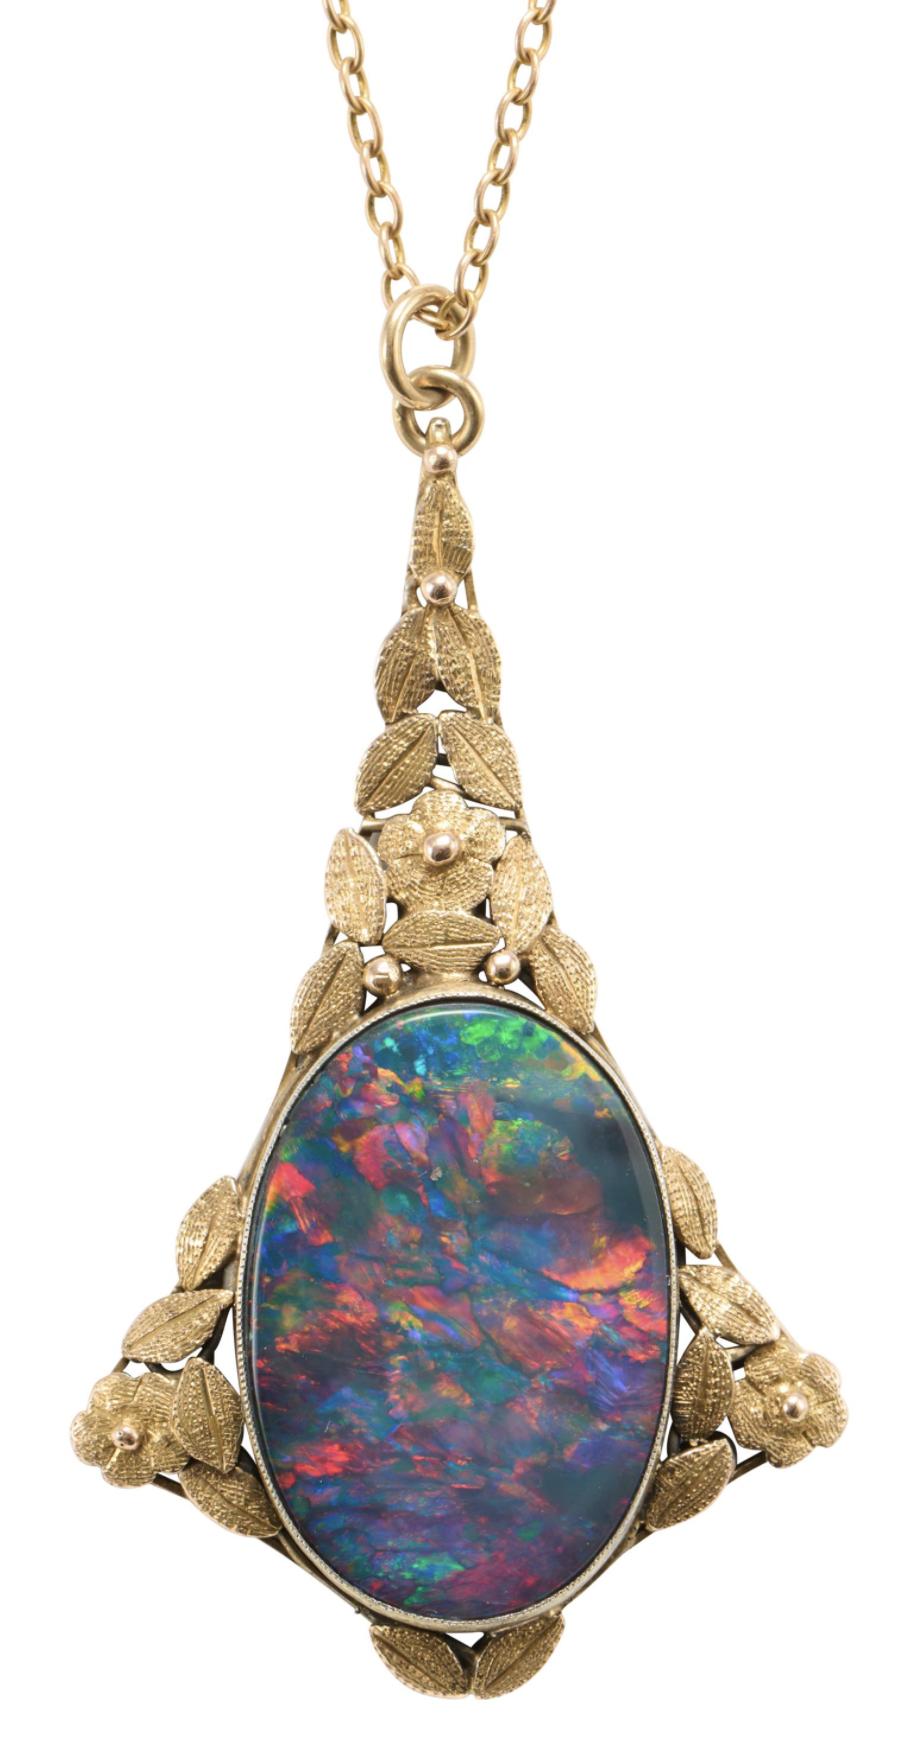 Opal Leonard joel Fine Jewels Auction